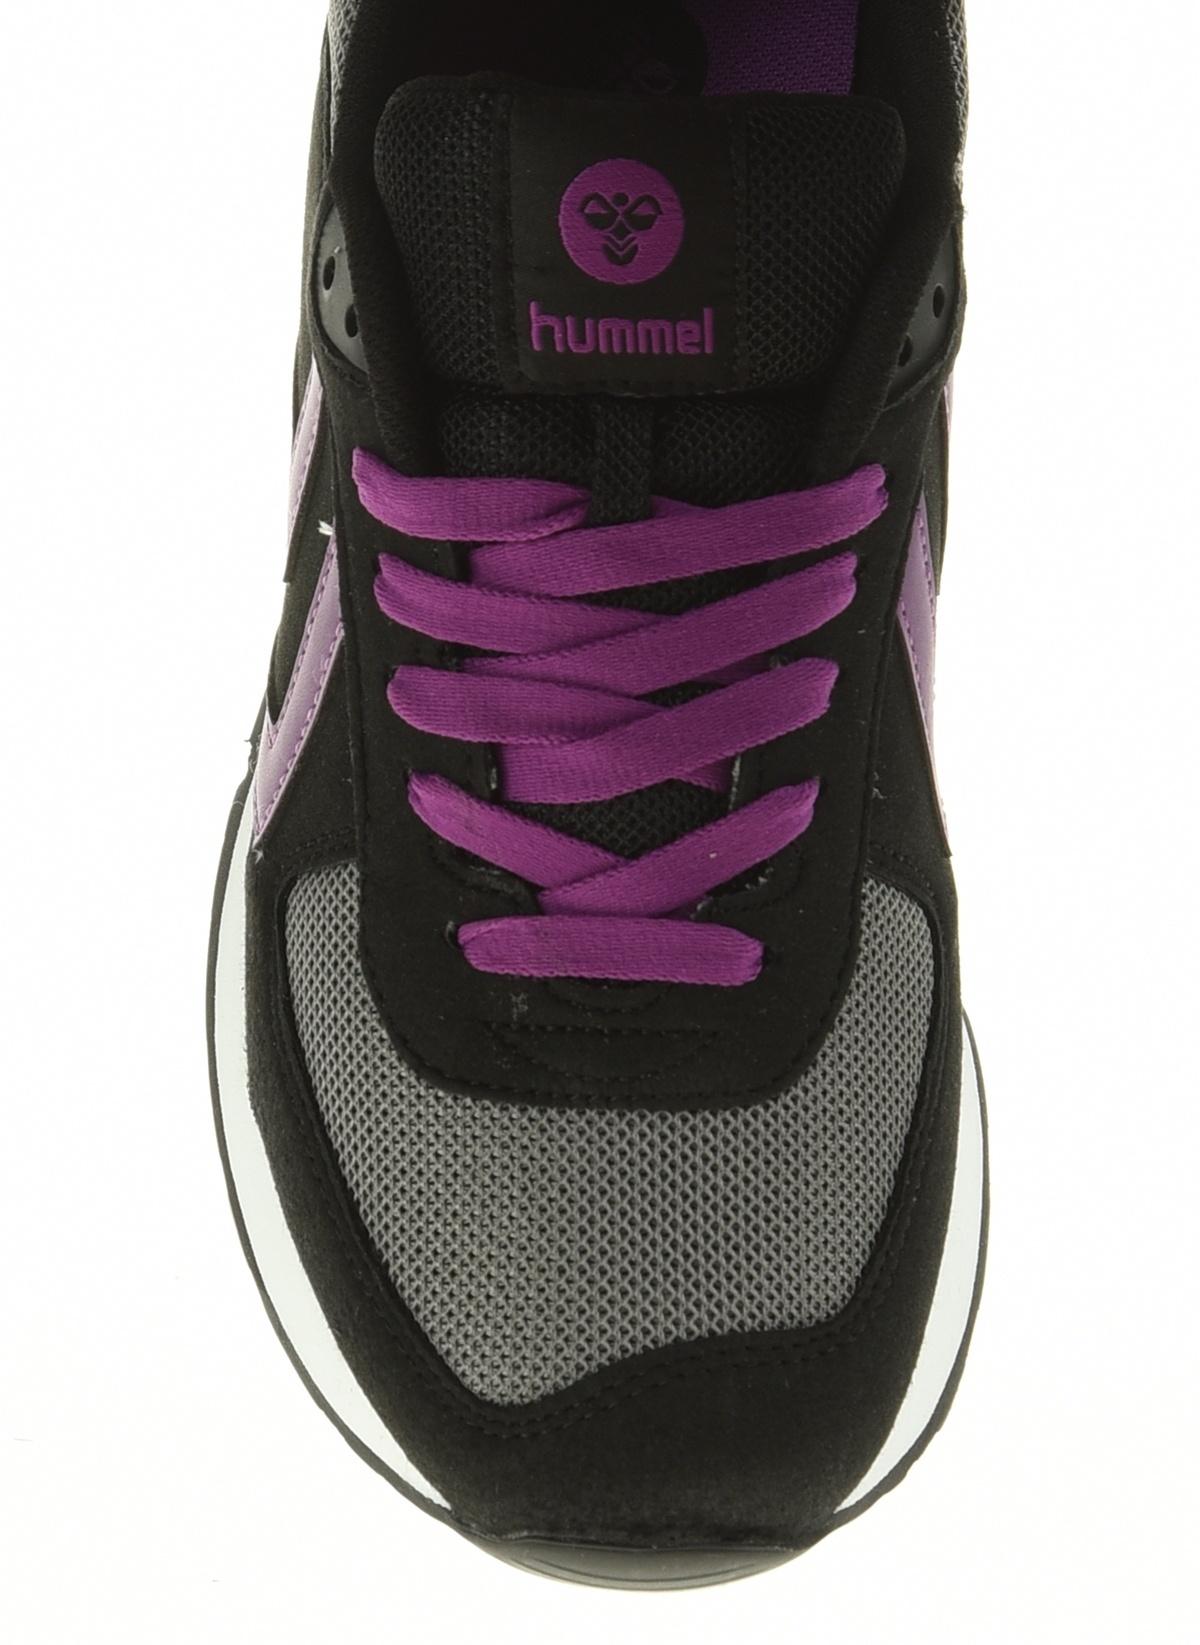 Hummel Unisex Eightyone Black Purple Morhipo 25464465